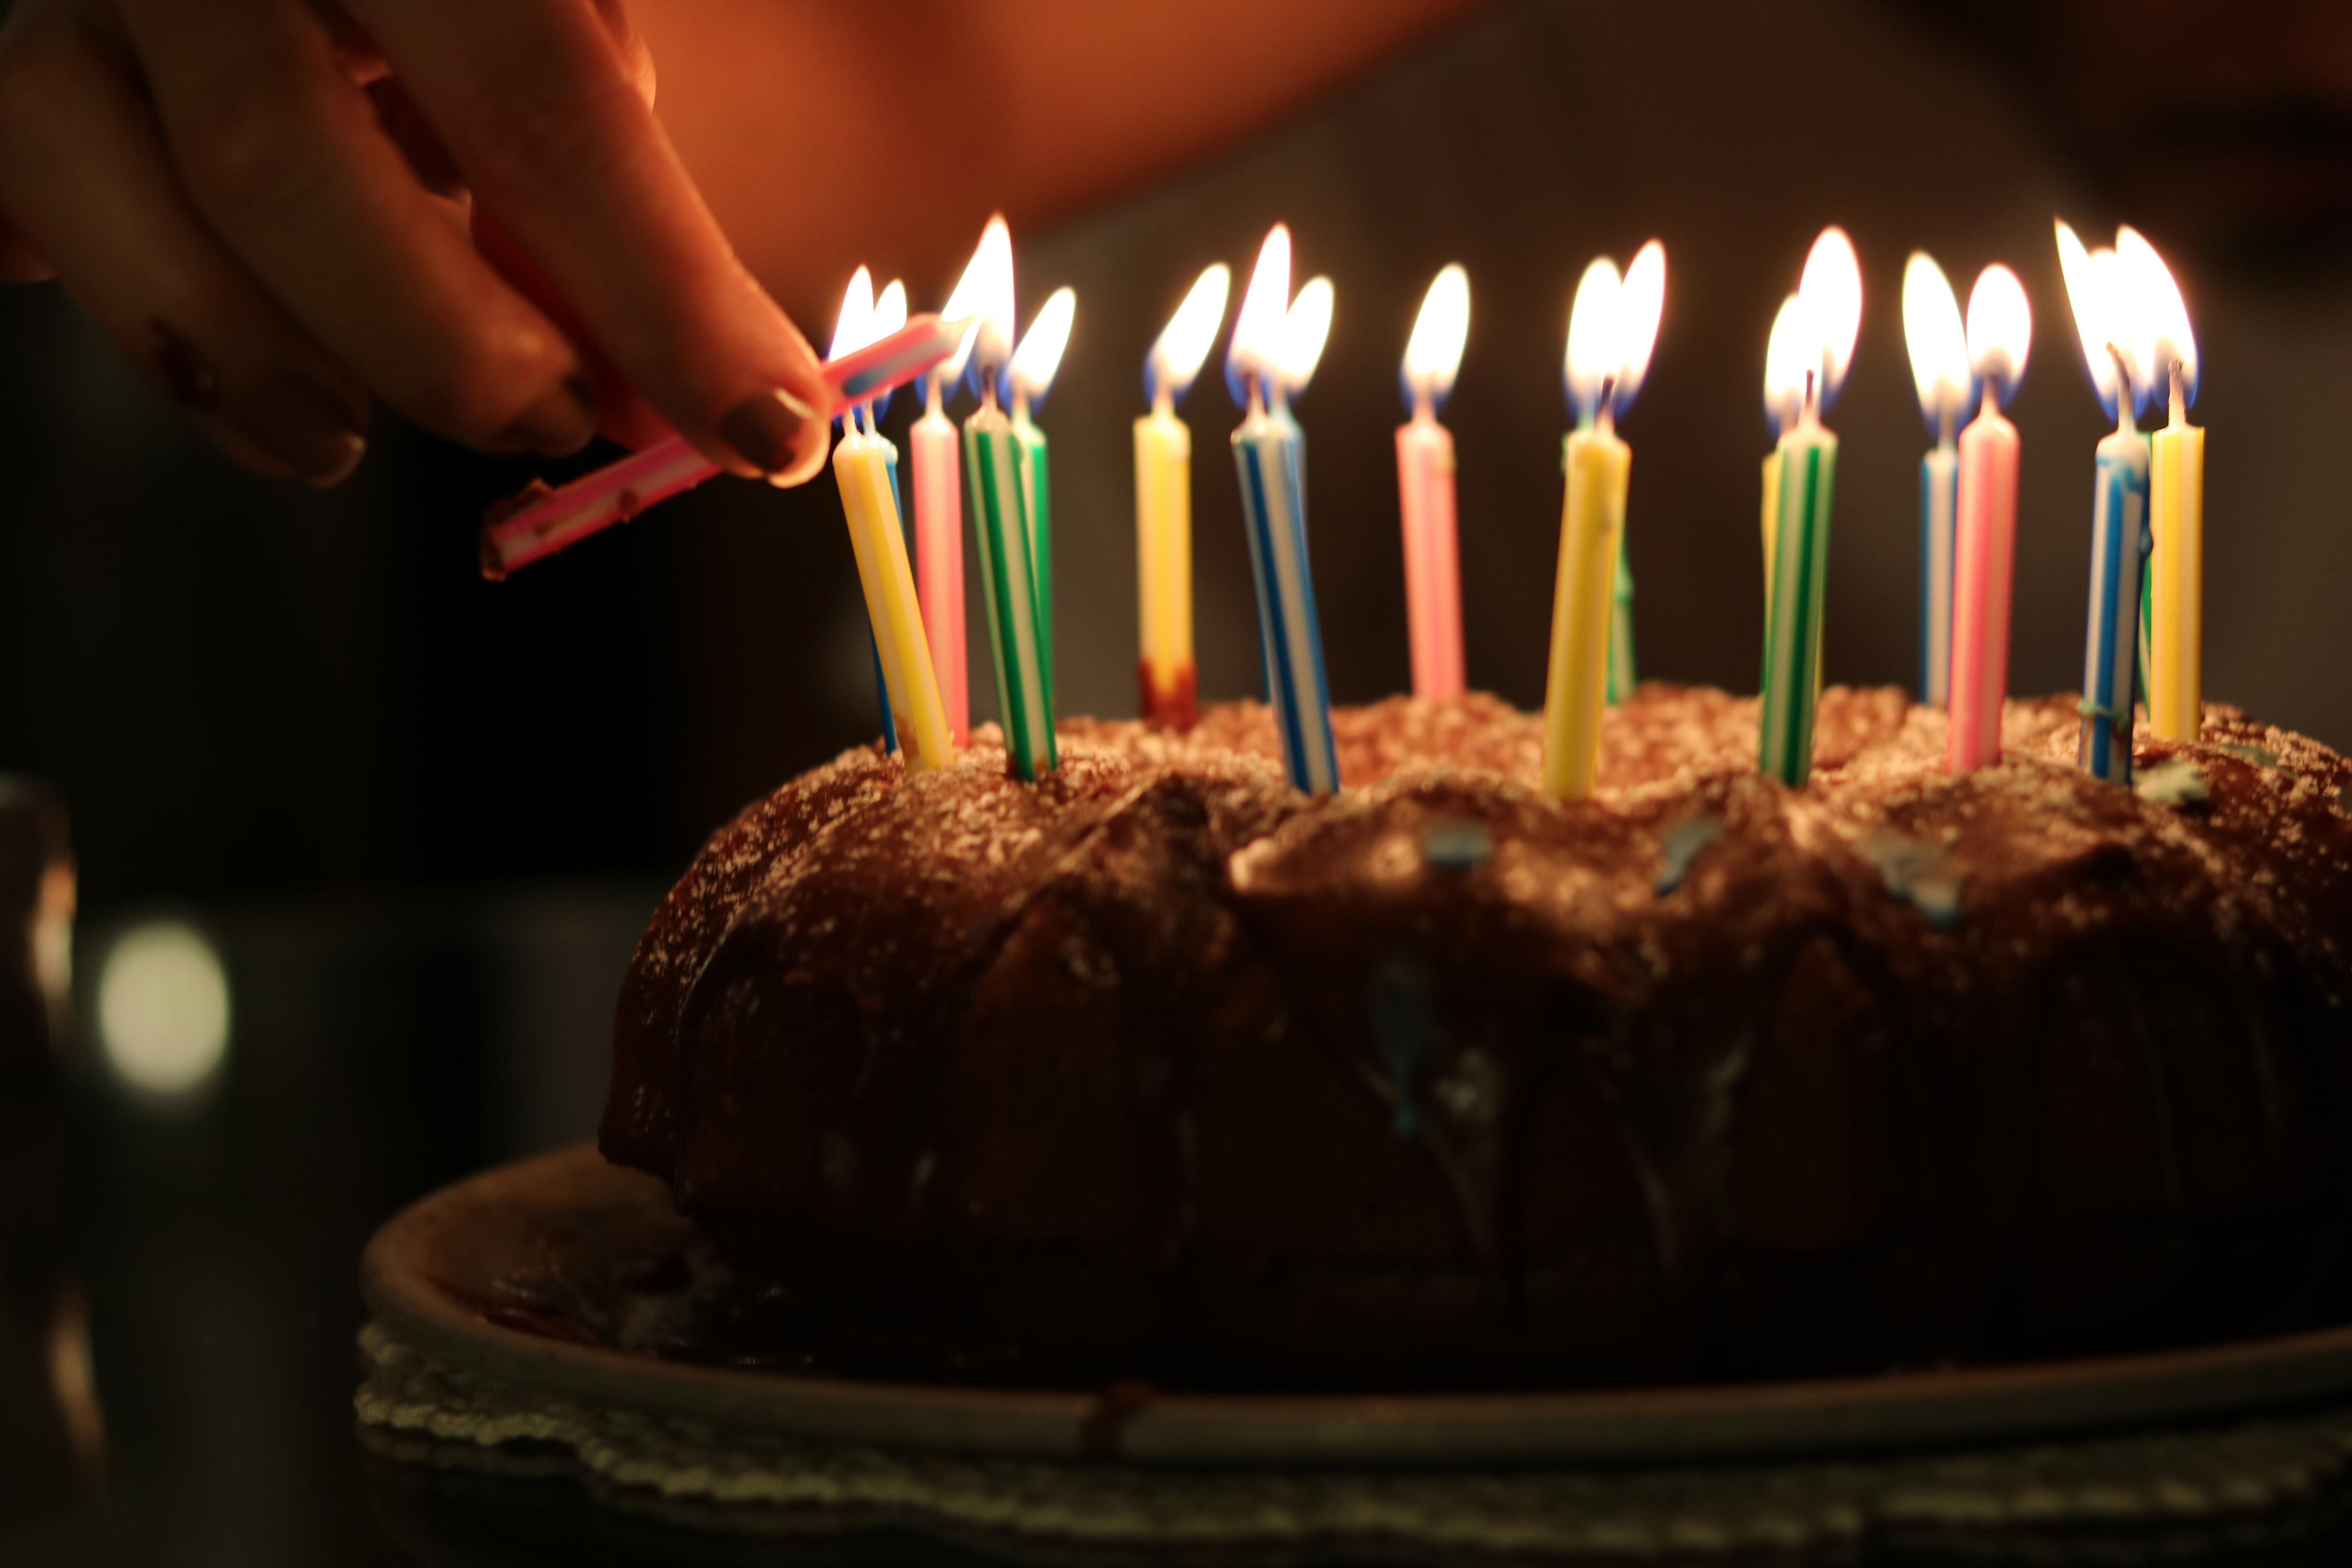 Free Images Birthday Cake Lighting Food Sweetness Chocolate Cake Dessert Baked Goods Flame Baking Icing Cuisine Birthday Candle Cake Decorating Event German Chocolate Cake Dish Pasteles 5000x3333 1614855 Free Stock Photos Pxhere